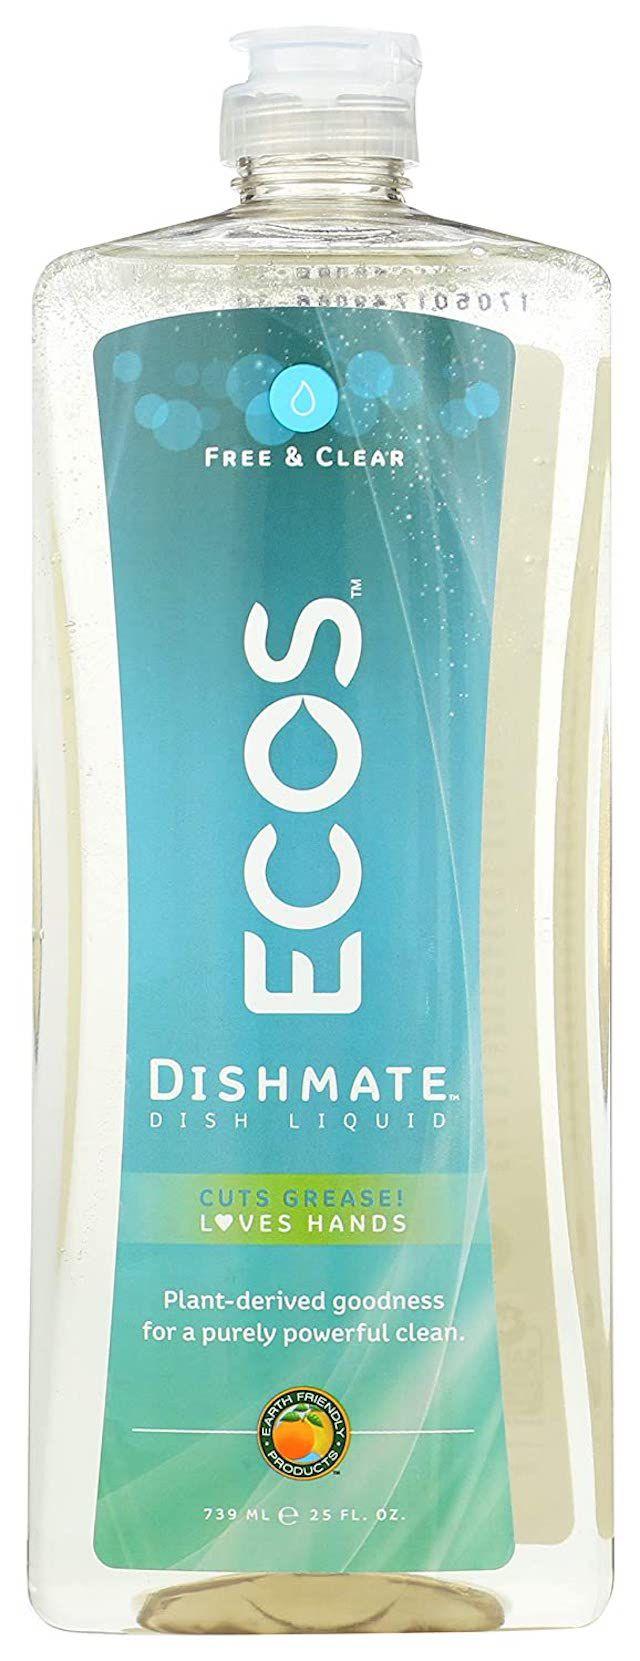 ECOS Dishmate Dish Soap Free & Clear